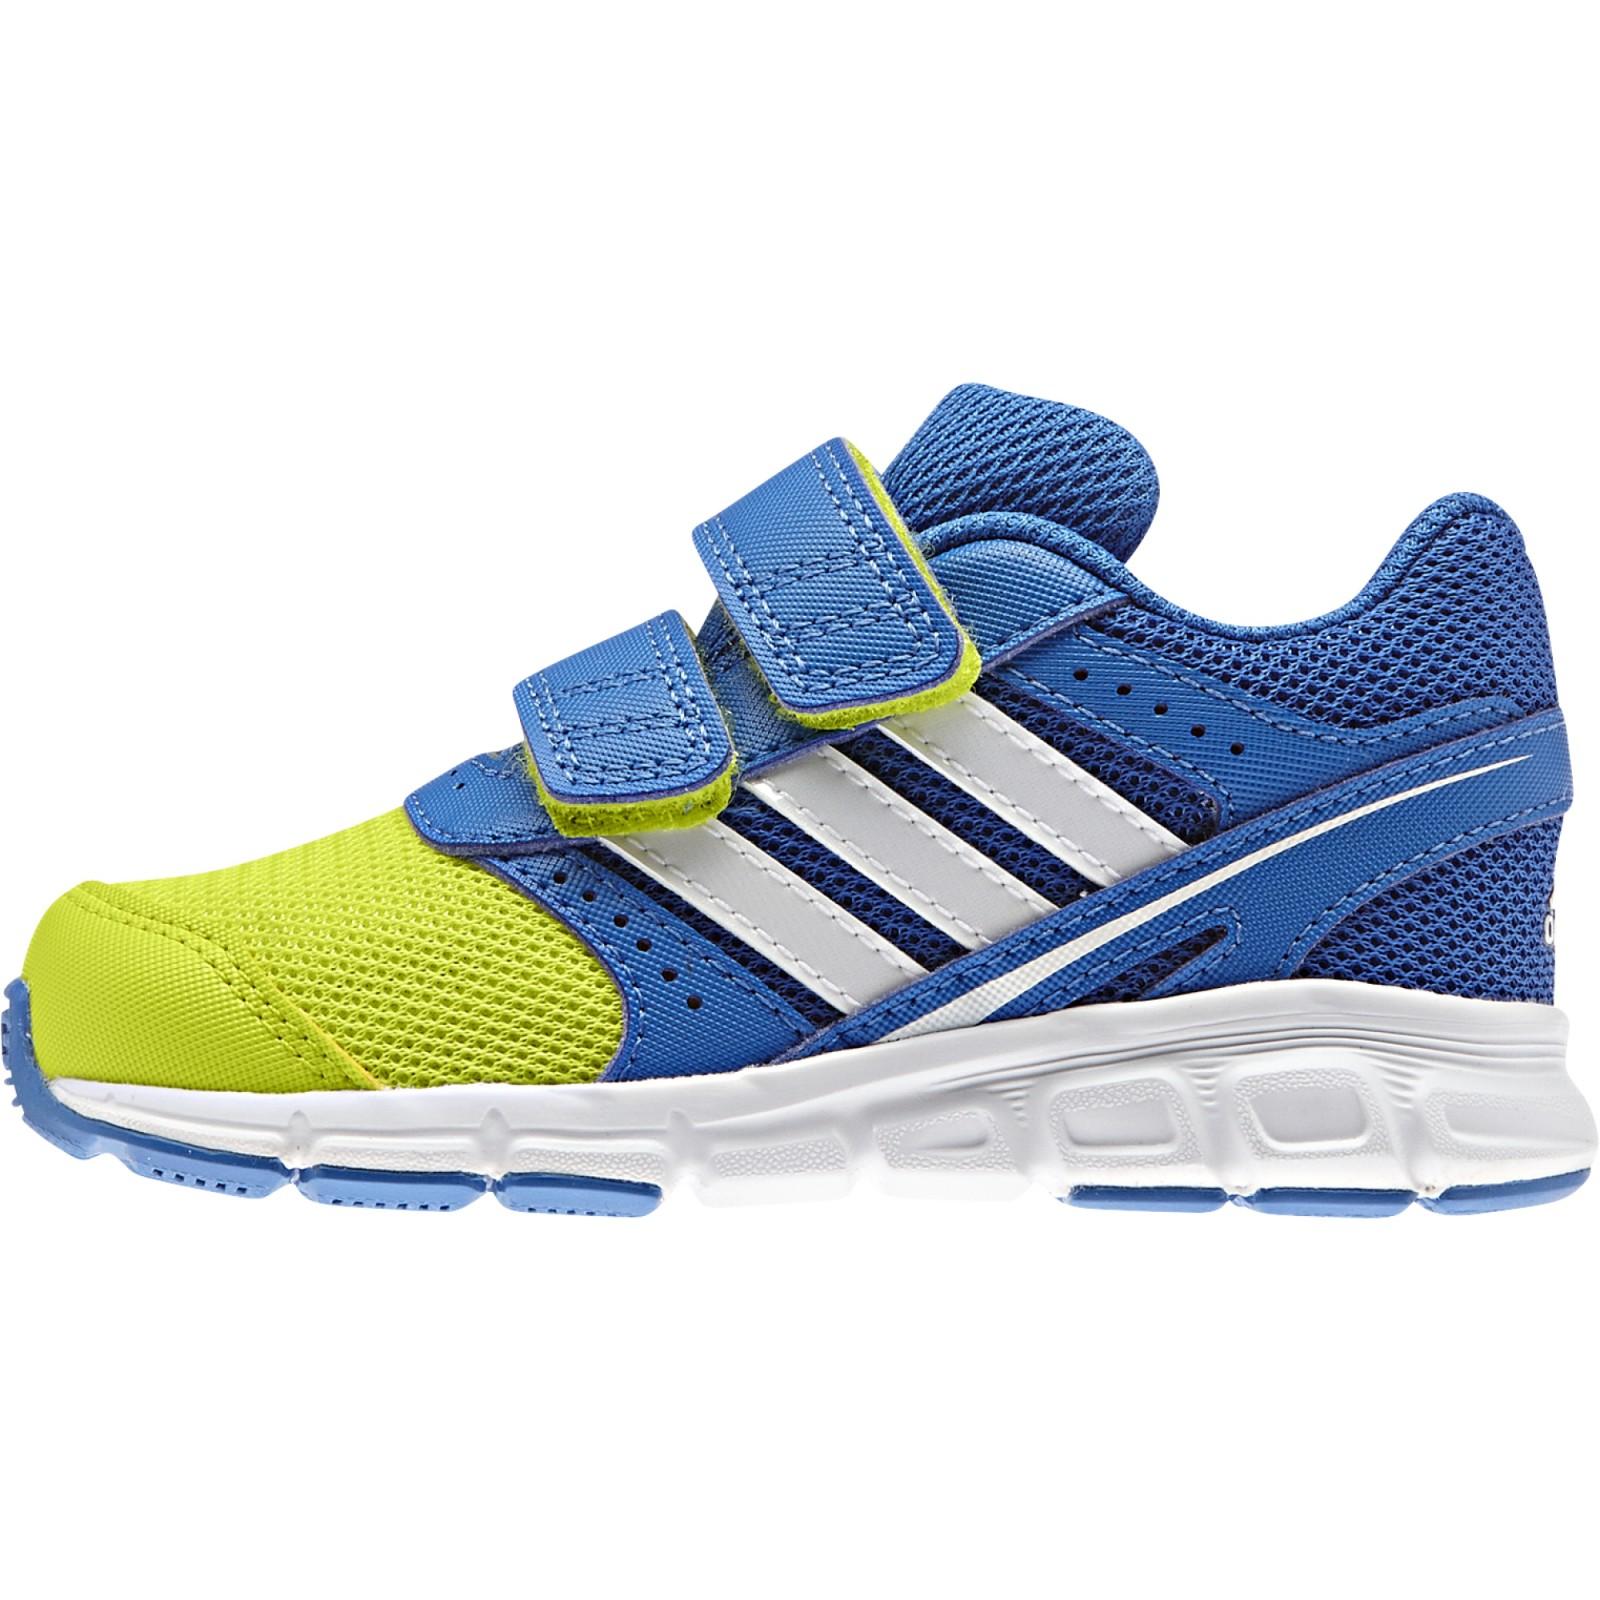 8873ec81f09 Dětské tenisky adidas hyperFast CF I